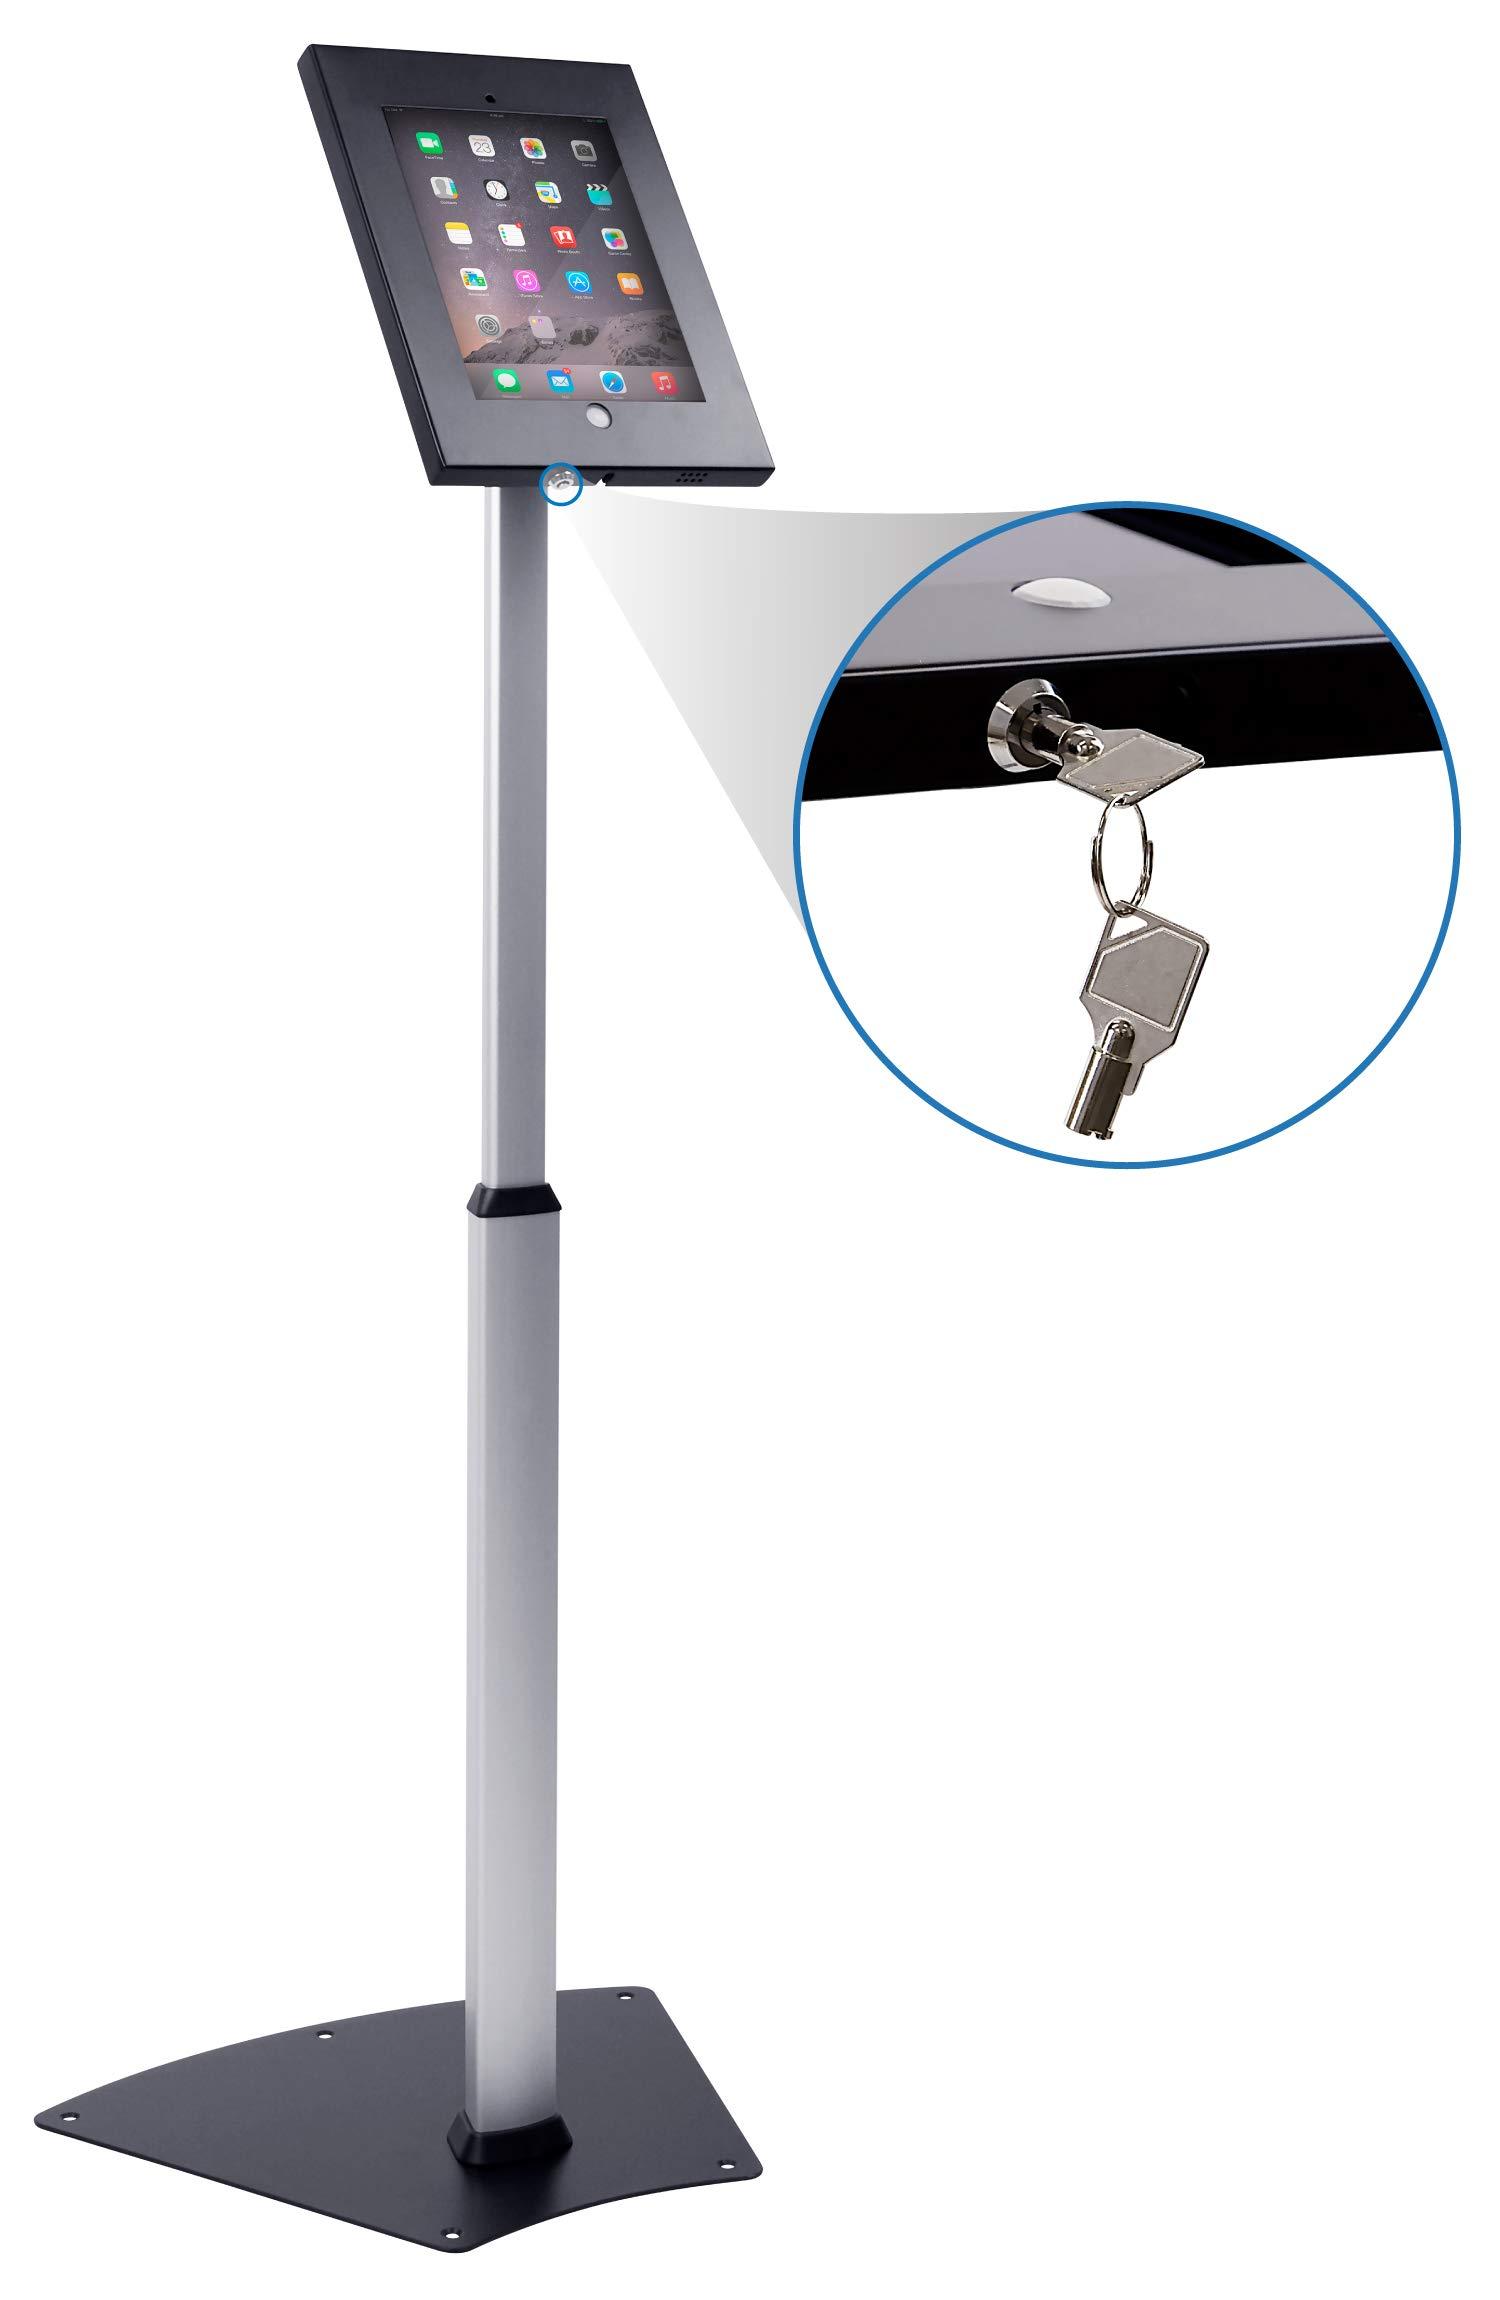 Mount-It! Secure iPad Floor Stand | Height Adjustable iPad Floor Stand | iPad Check-in Stand | Anti-Theft Tablet Floor Stand for iPad 9.7 (MI-3783) by Mount-It!